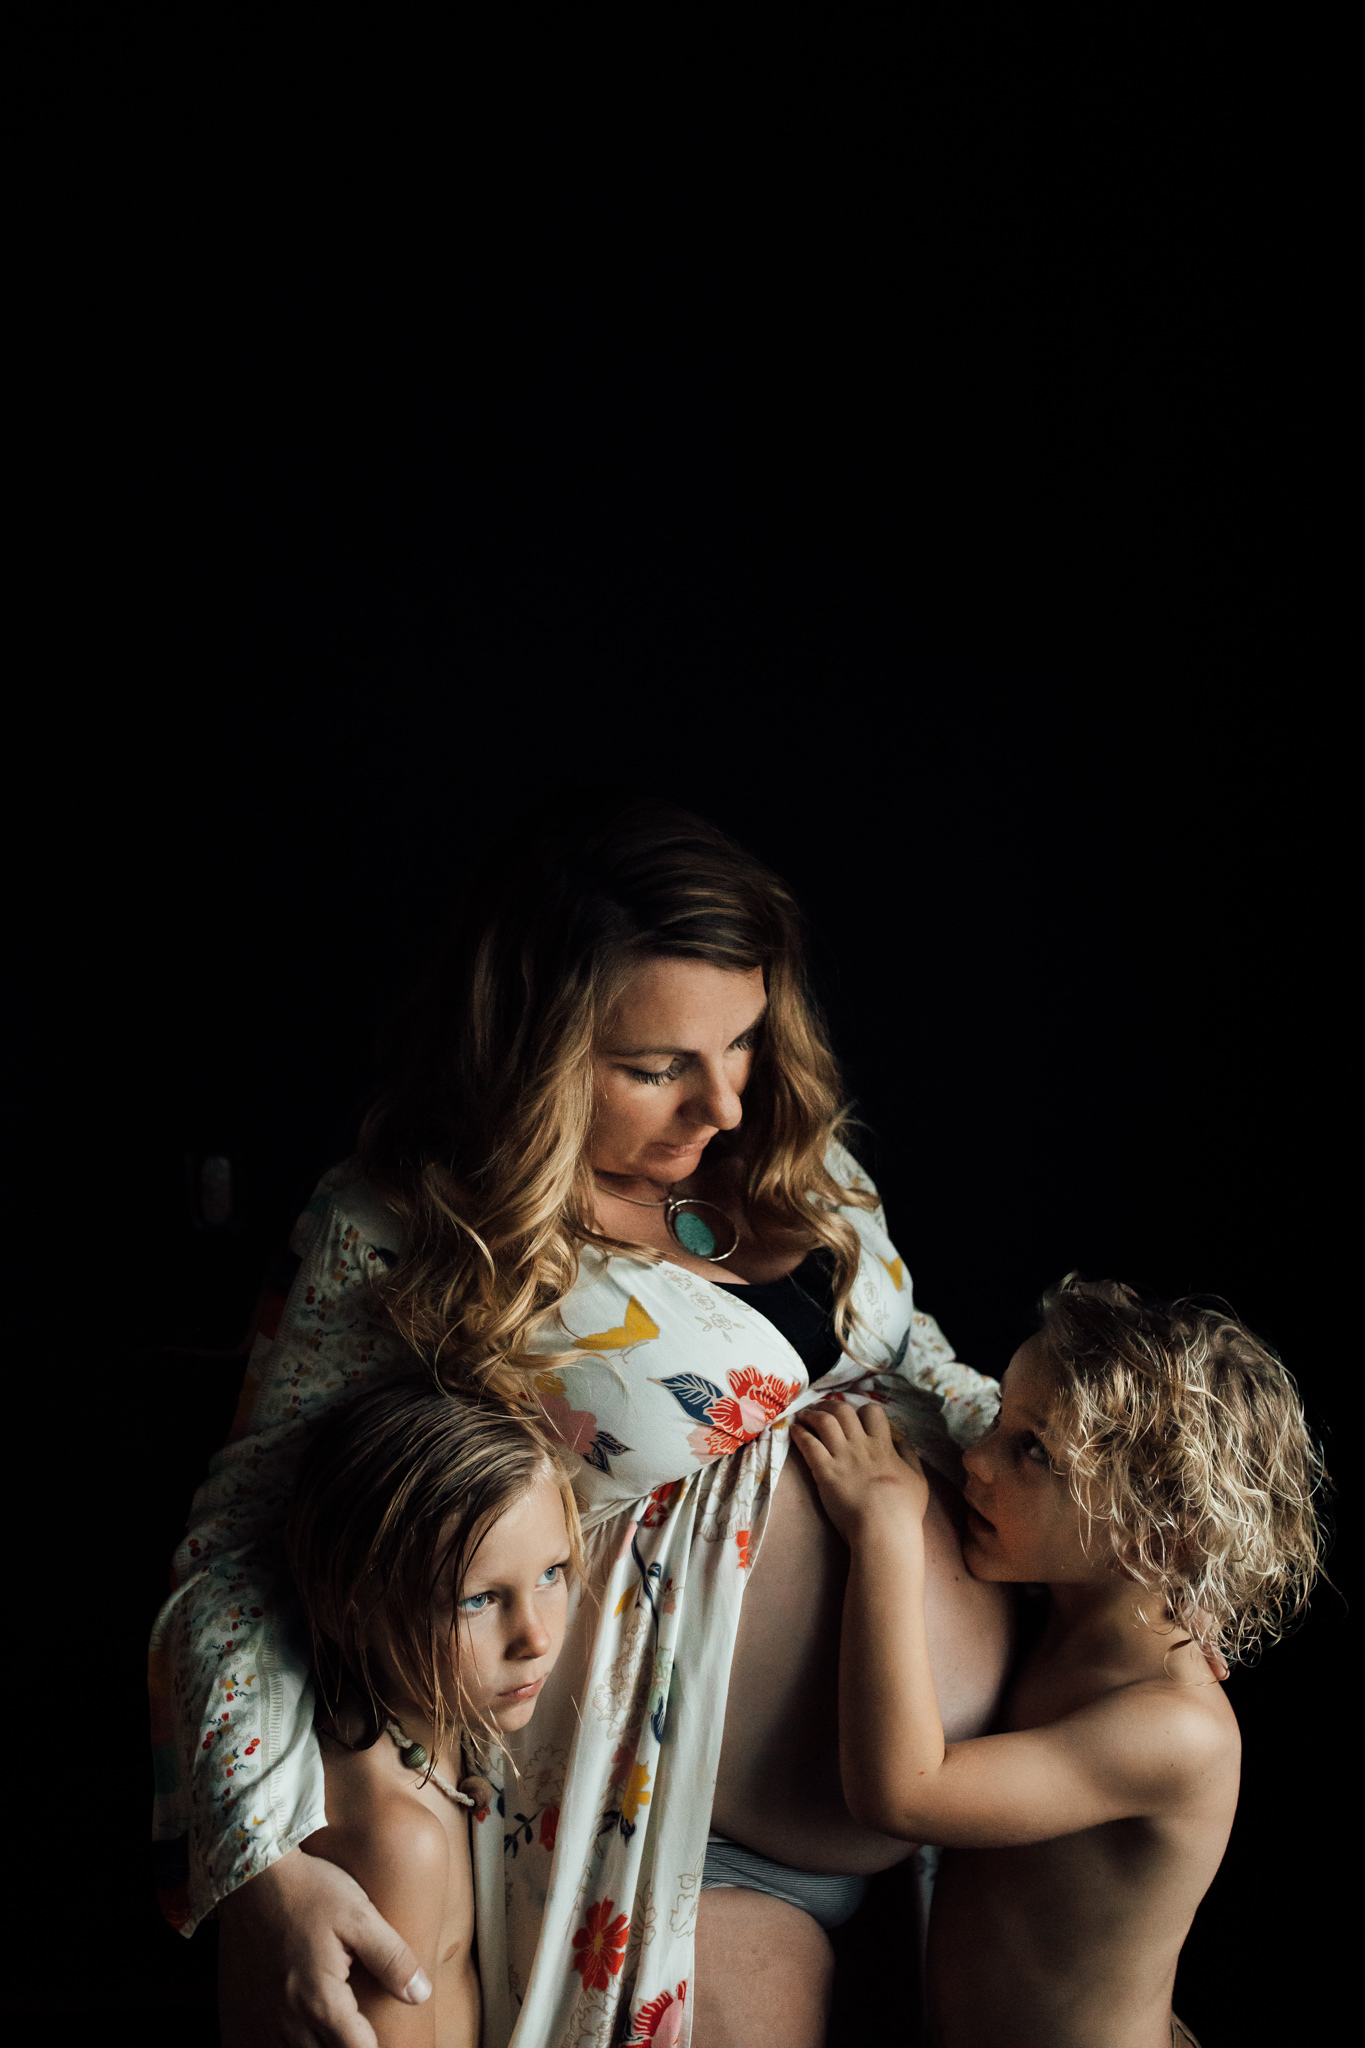 birth-photography-documentary-family-photographer-28.jpg